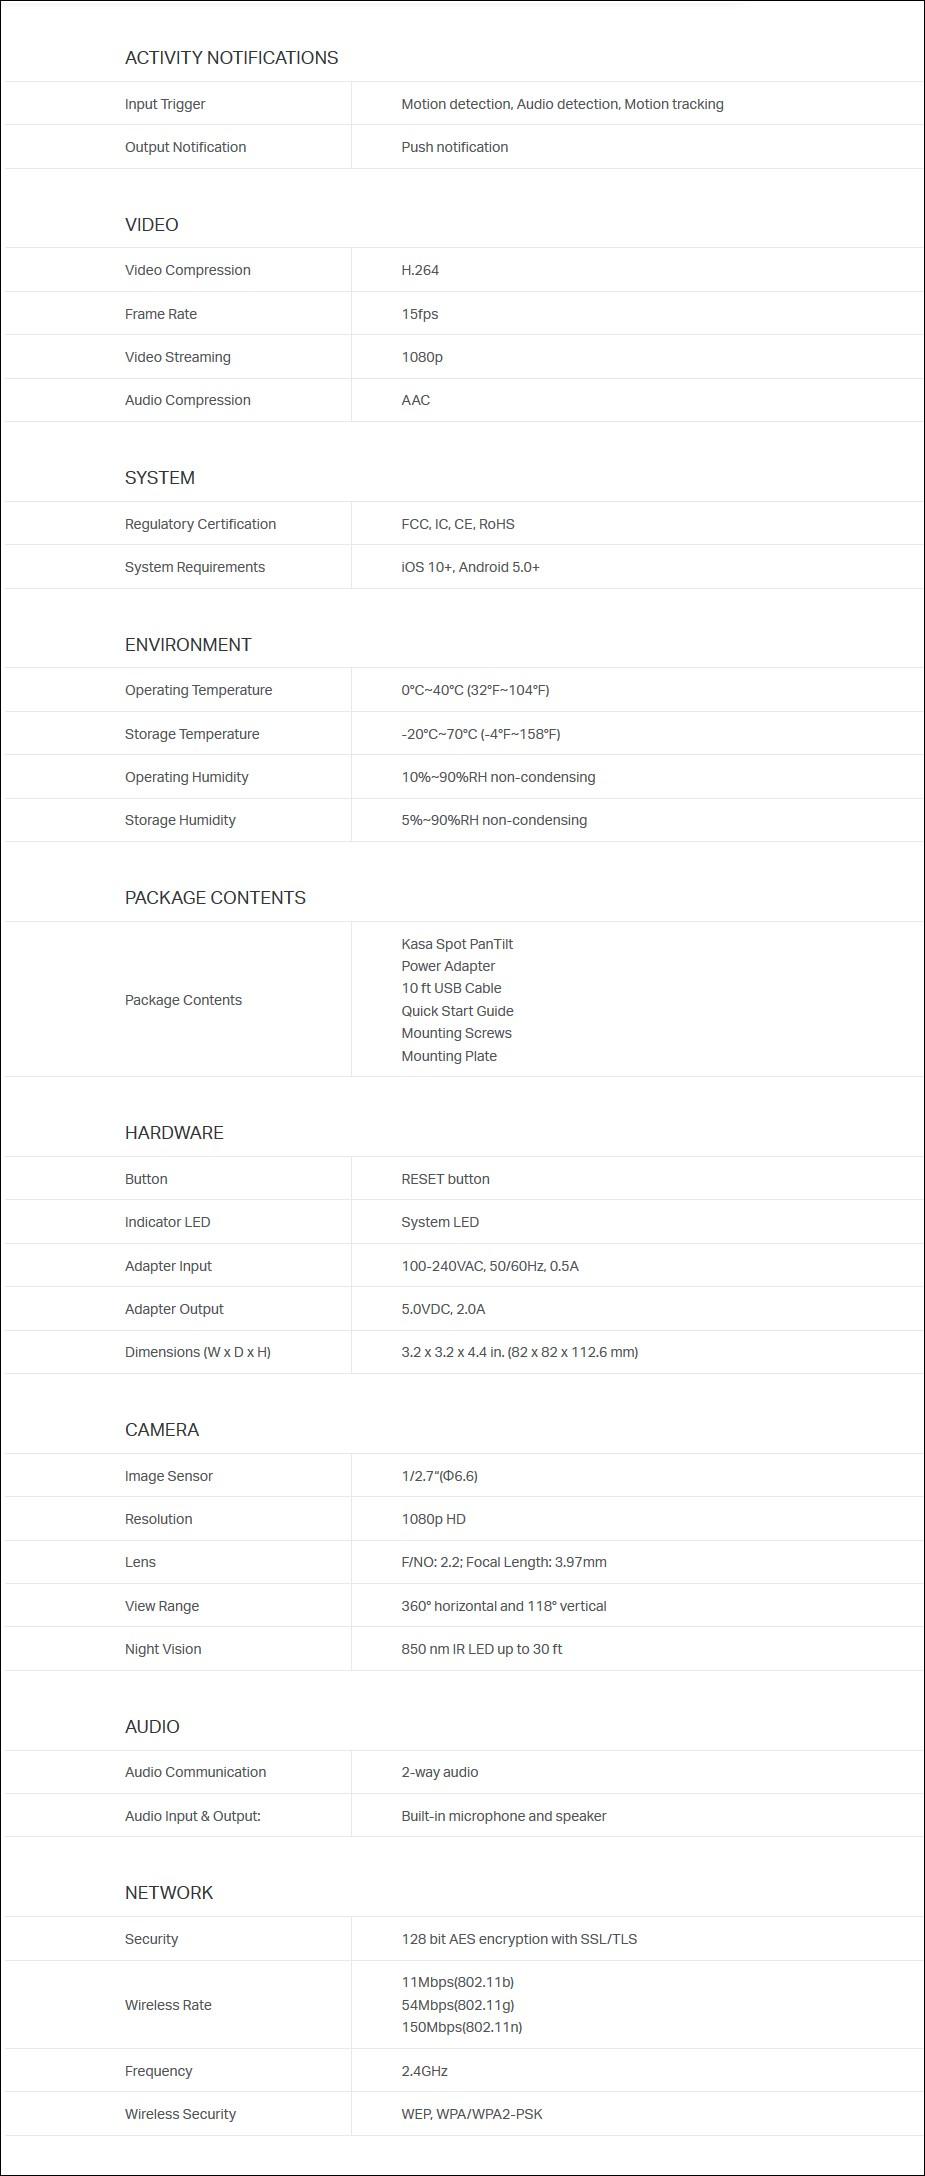 TP-Link KC110 Kasa Spot Pan Tilt 1080p Indoor Security Camera - Overview 2